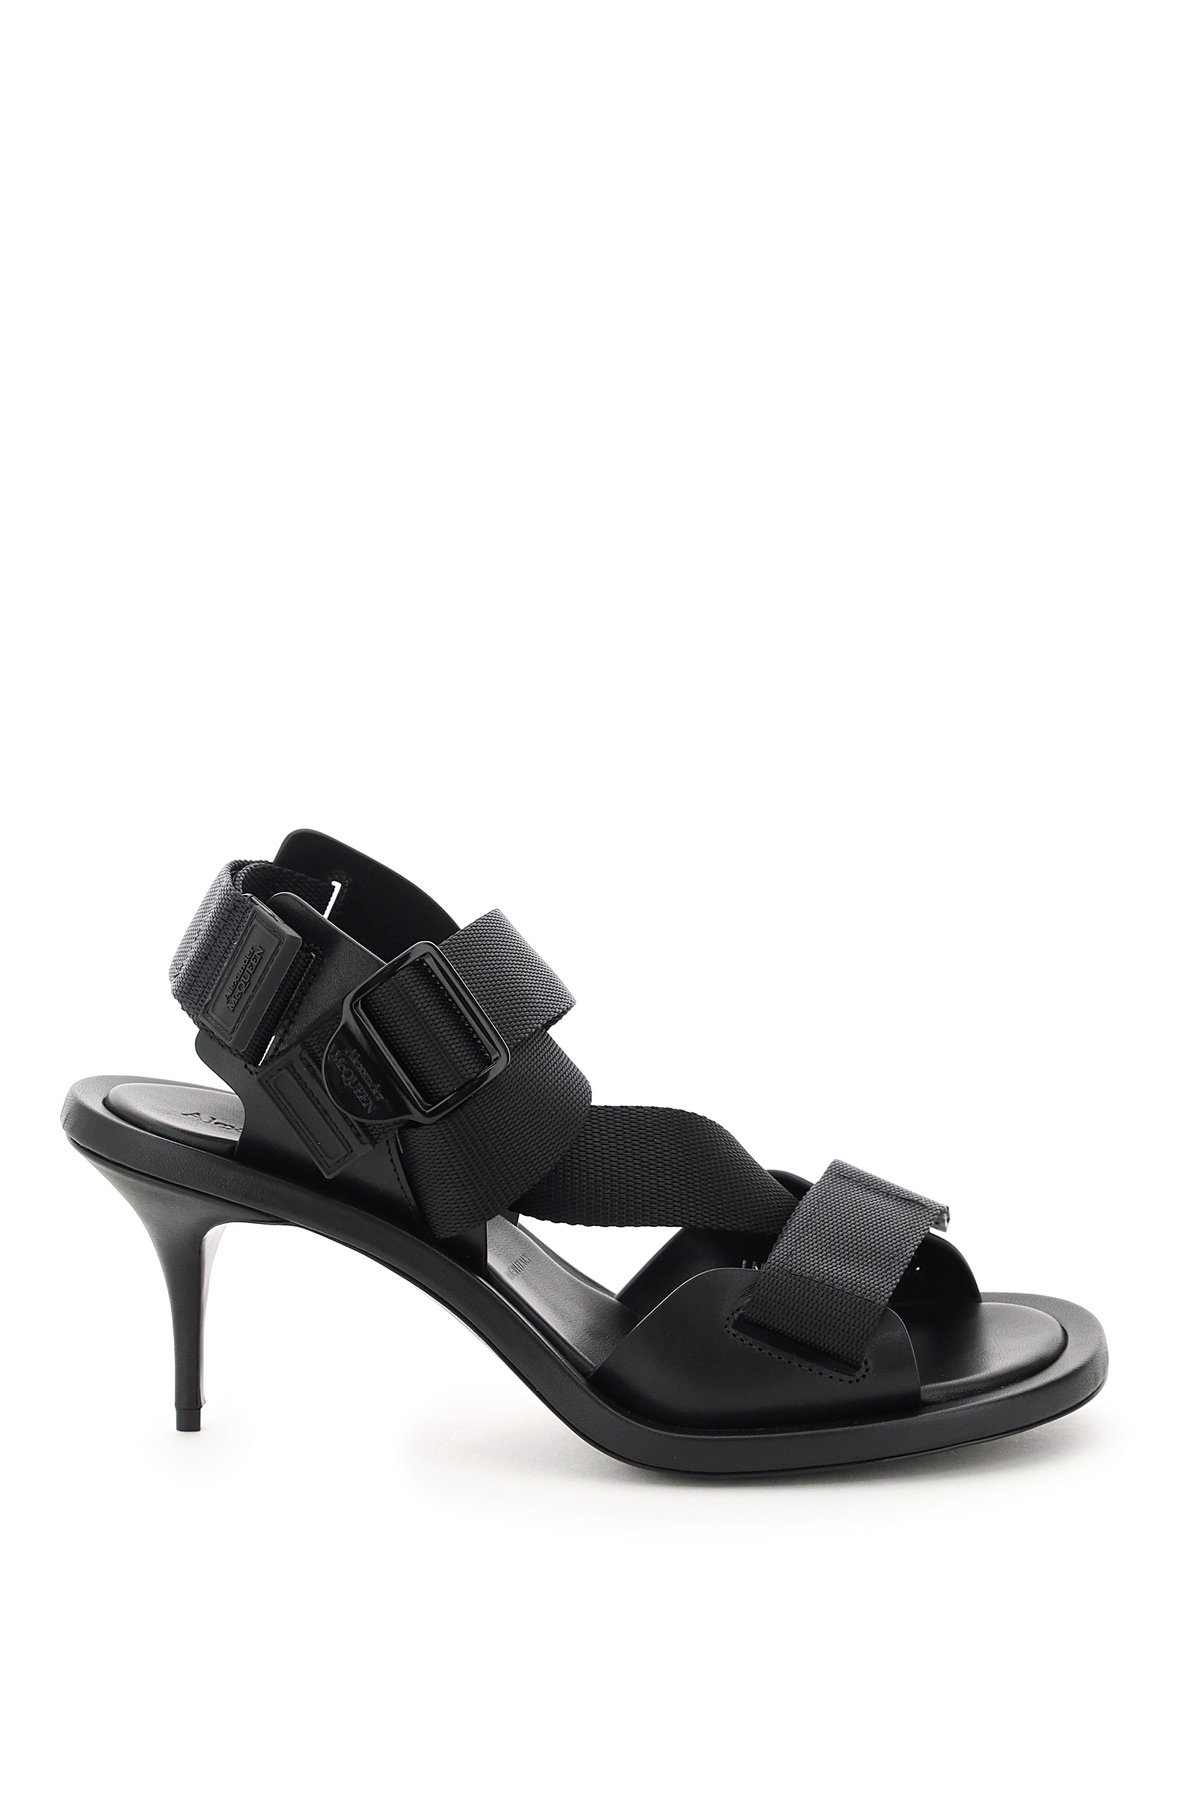 Alexander mcqueen sandali con cinturini in tessuto